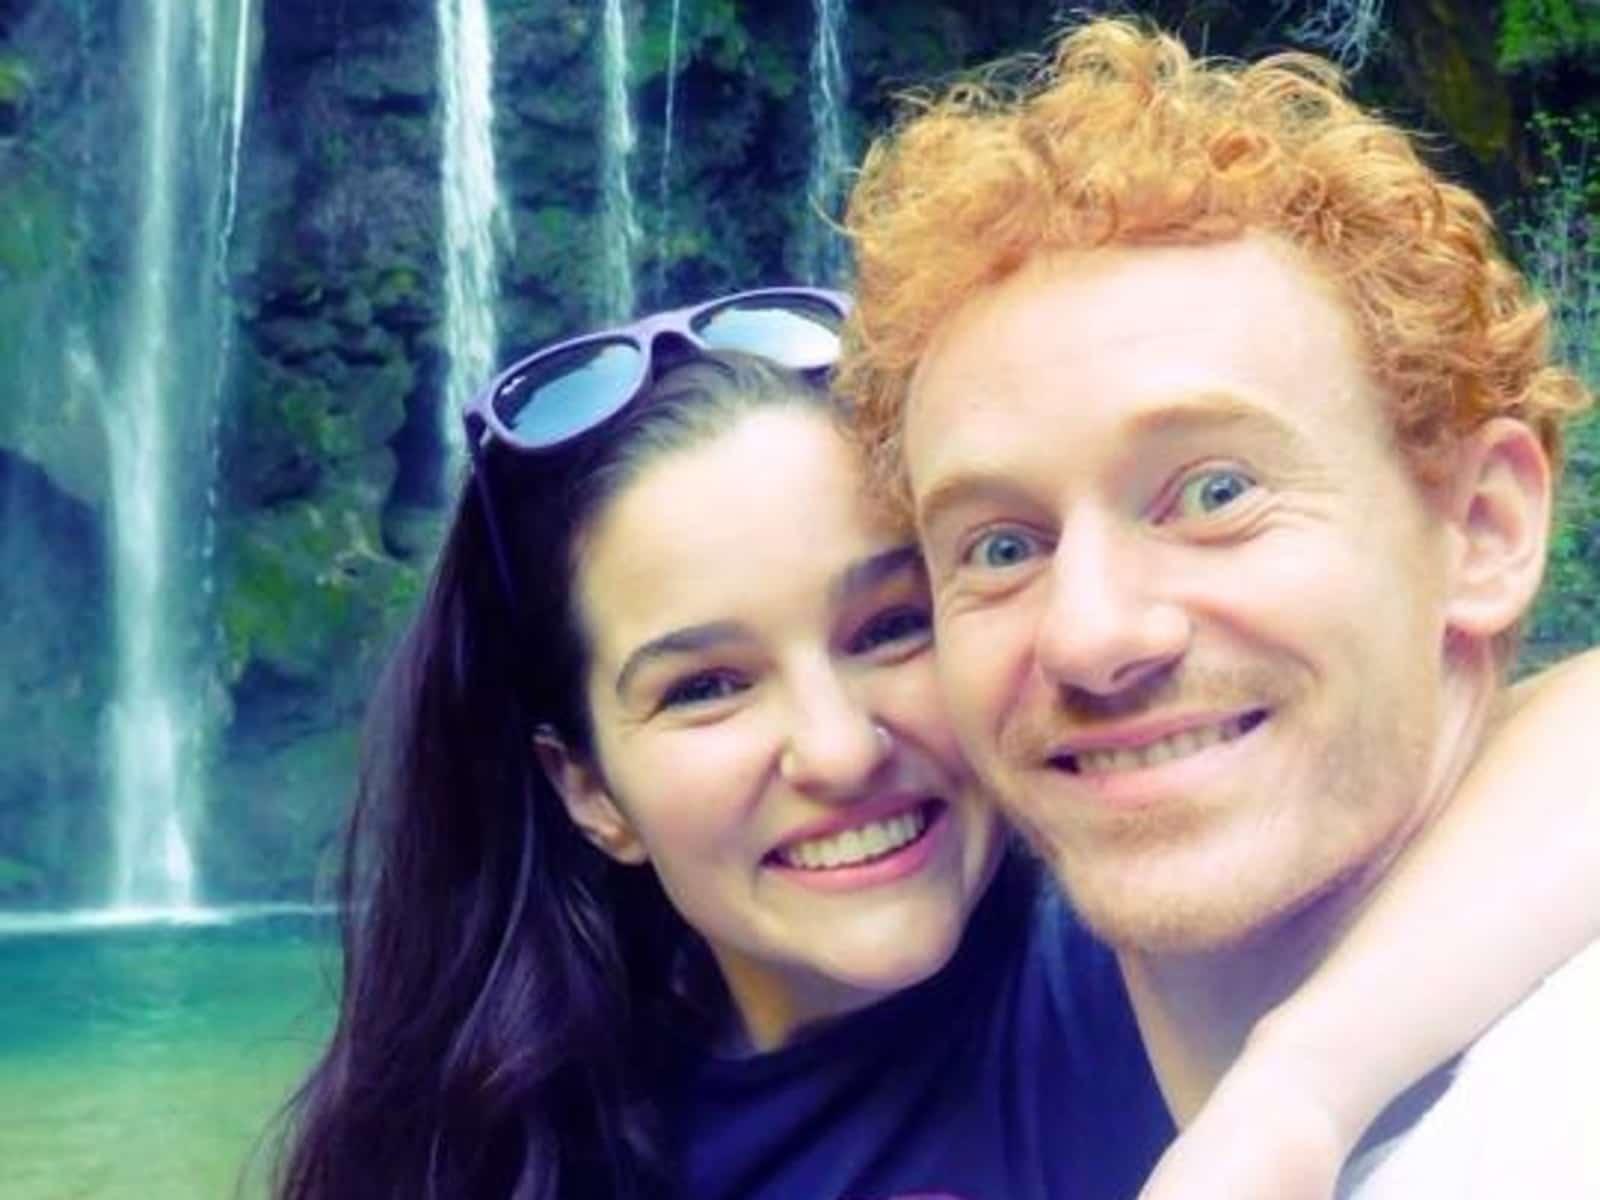 Walter & Kimberly from Dungarvan, Ireland